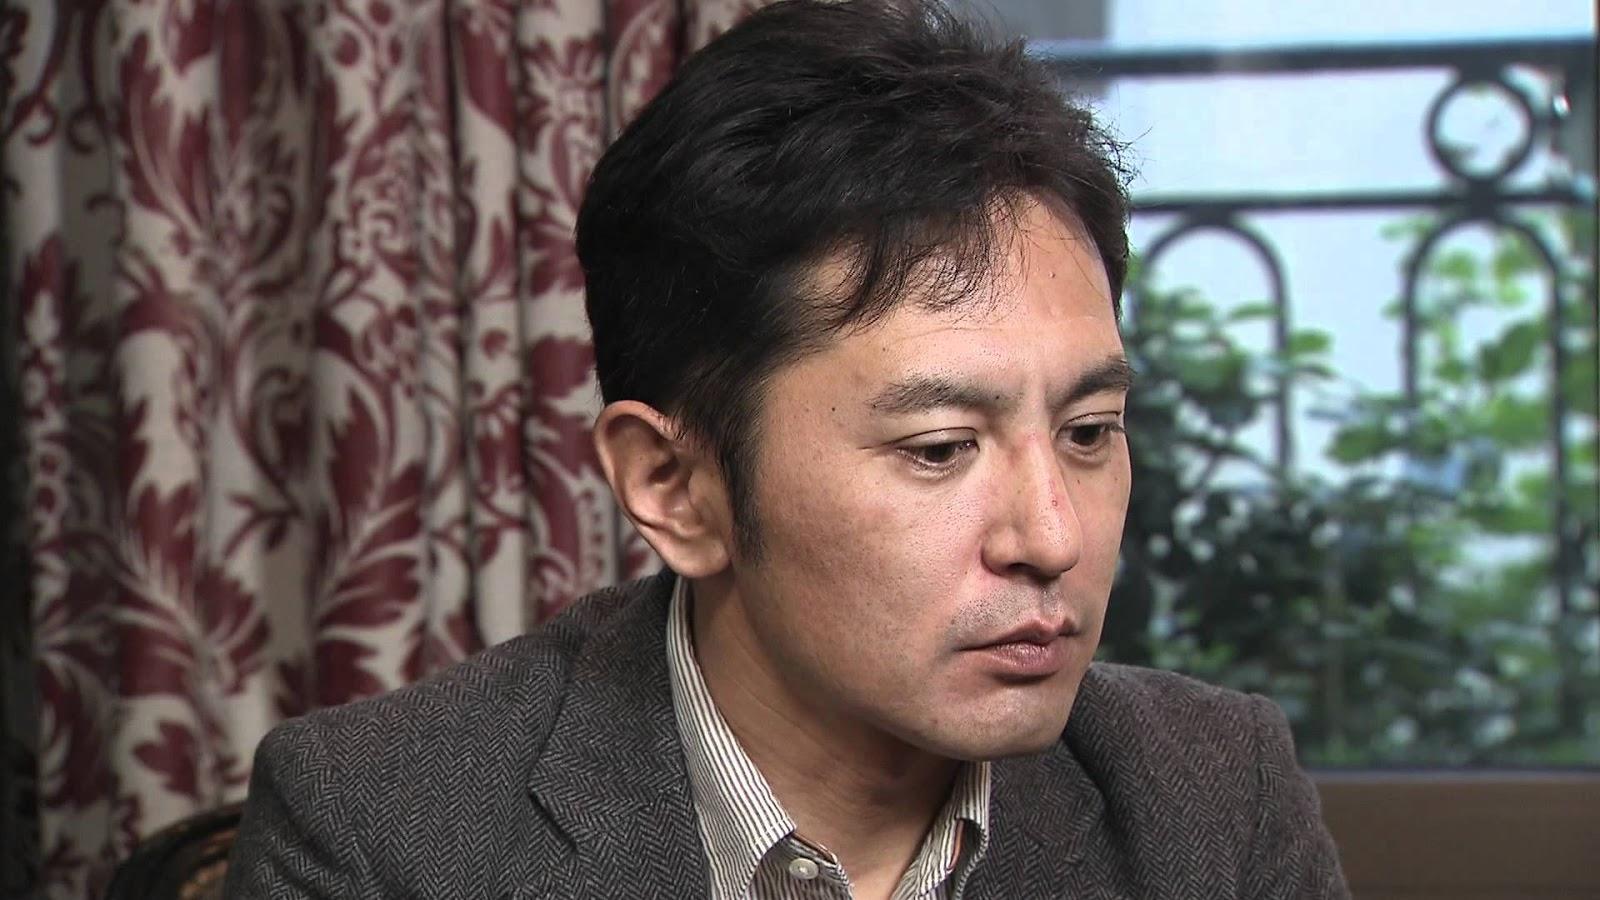 The Big Revelation: New Hayao Miyazaki, meet The Goro Miyazaki Projects